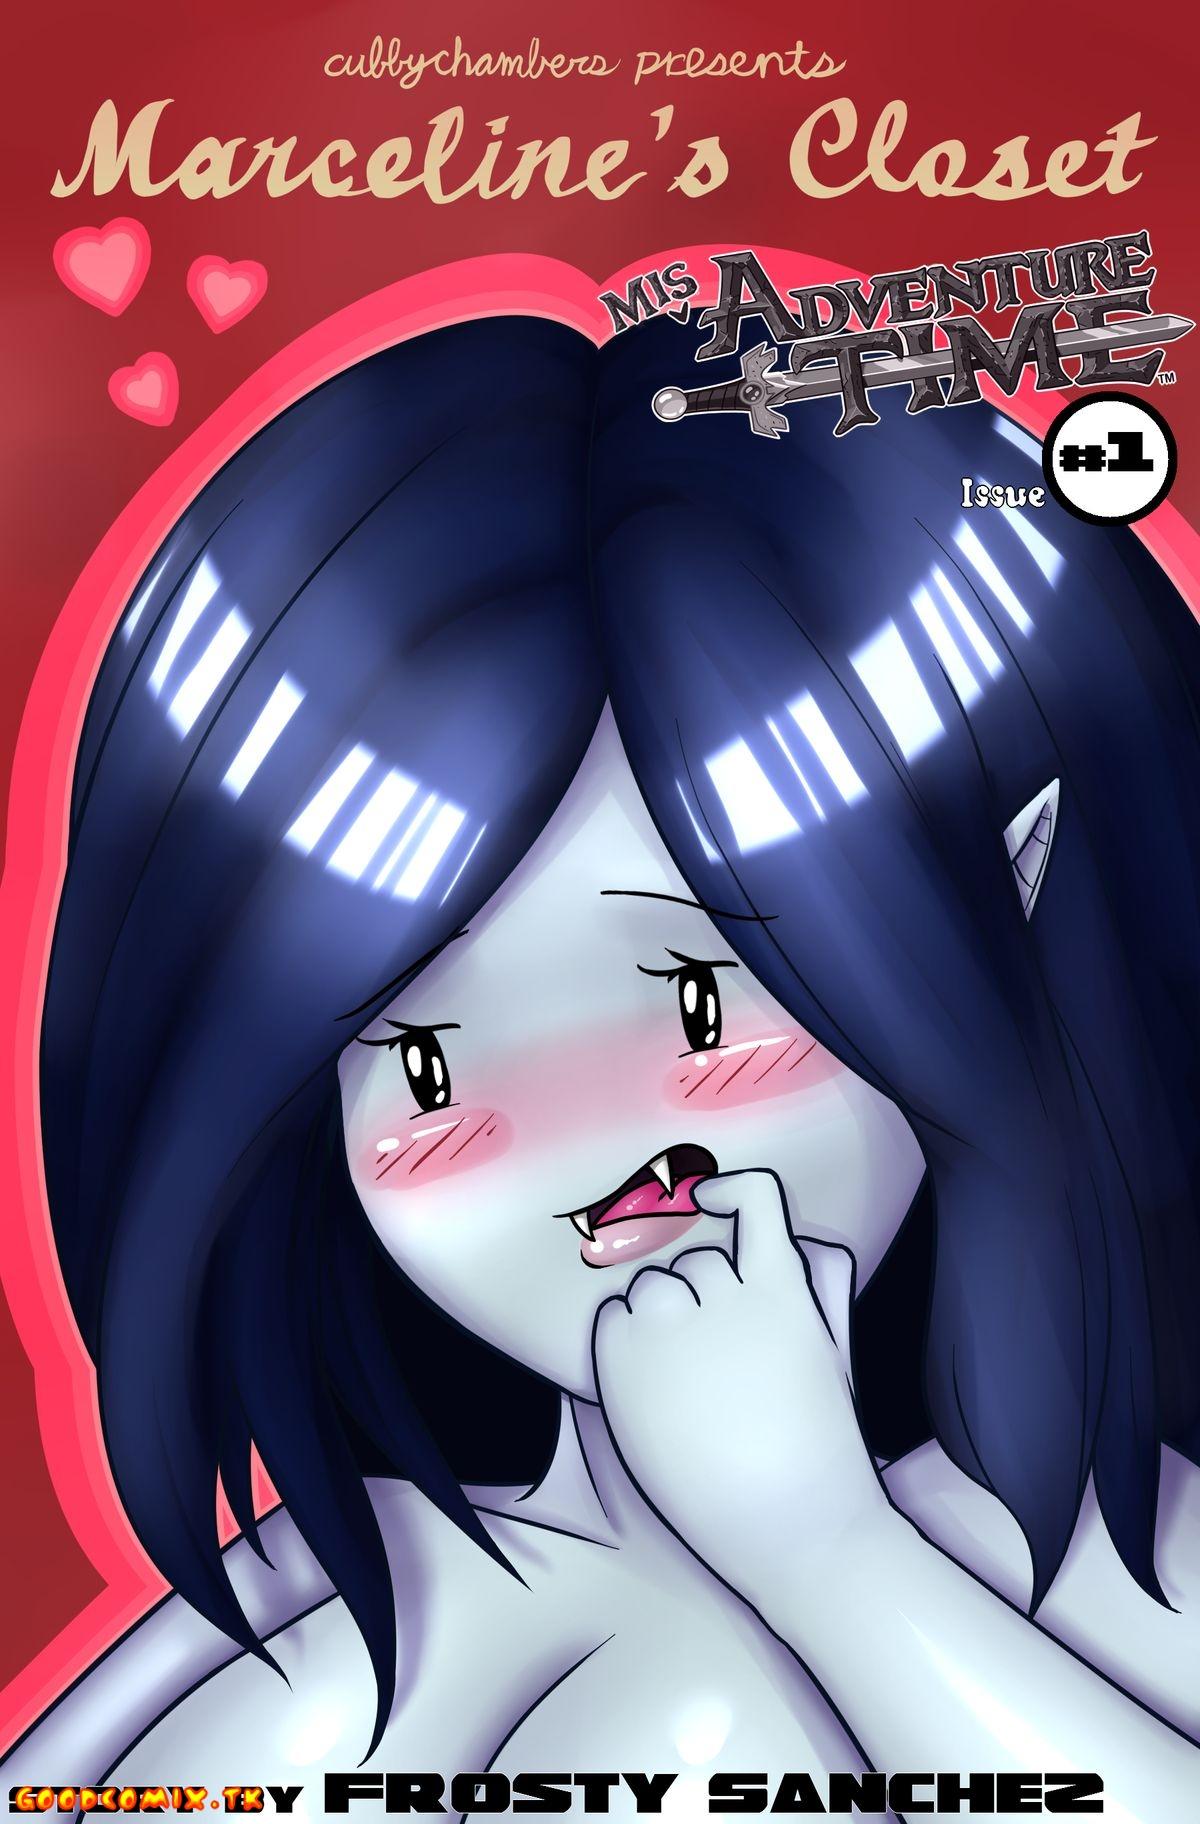 Goodcomix Adventure Time - MisAdventure Time Issue #1 - Marceline's Closet xxx porno